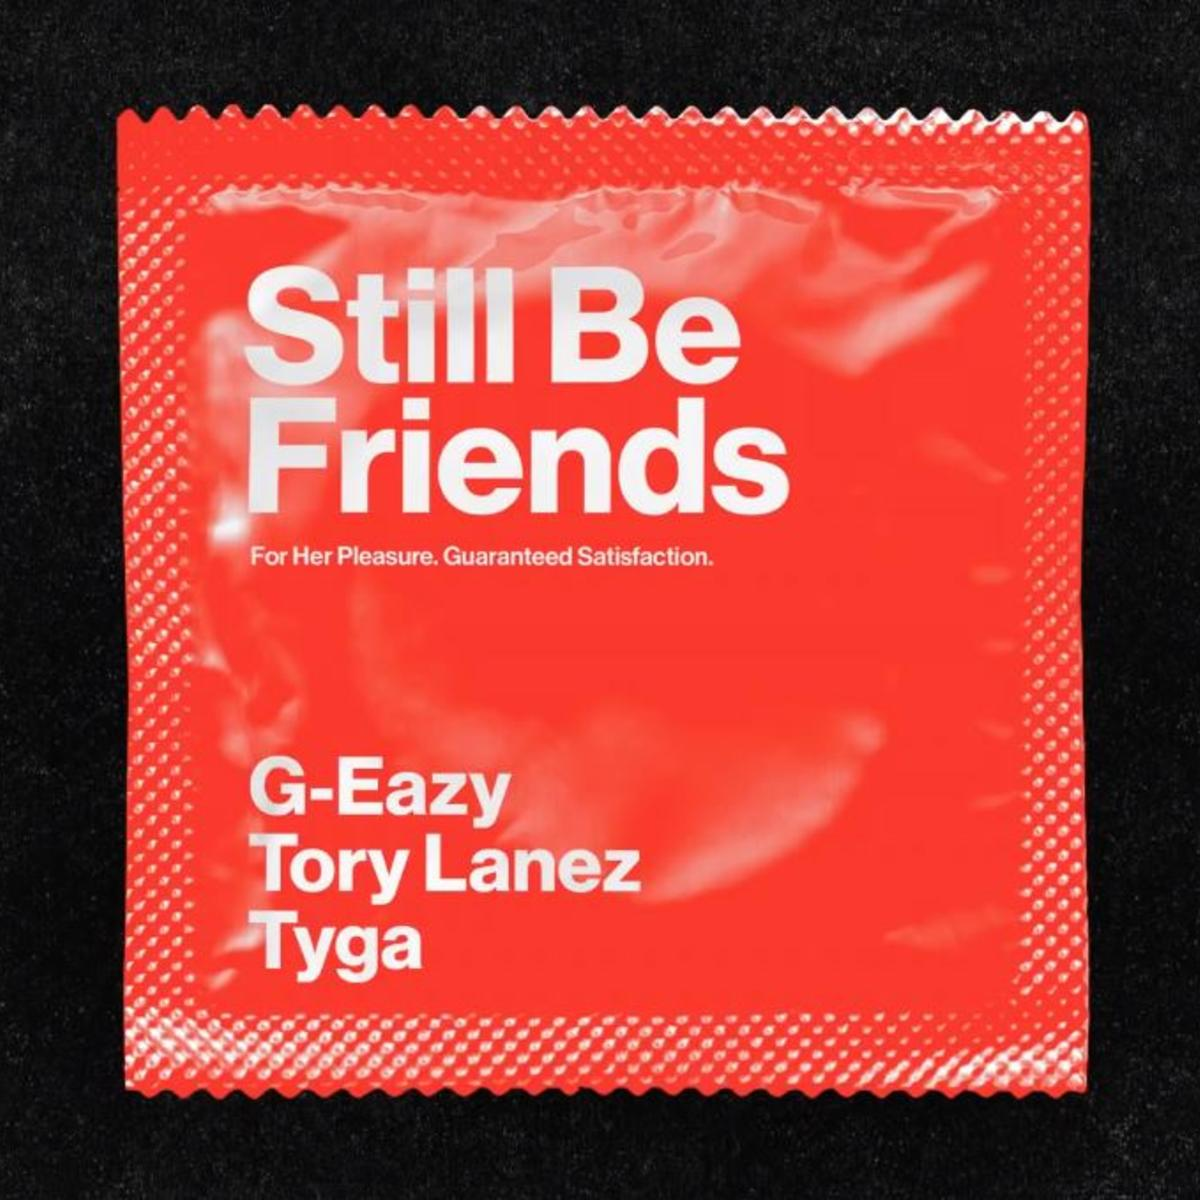 G-Eazy 'STILL BE FRIENDS' Ft Tyga & Tory Lanez